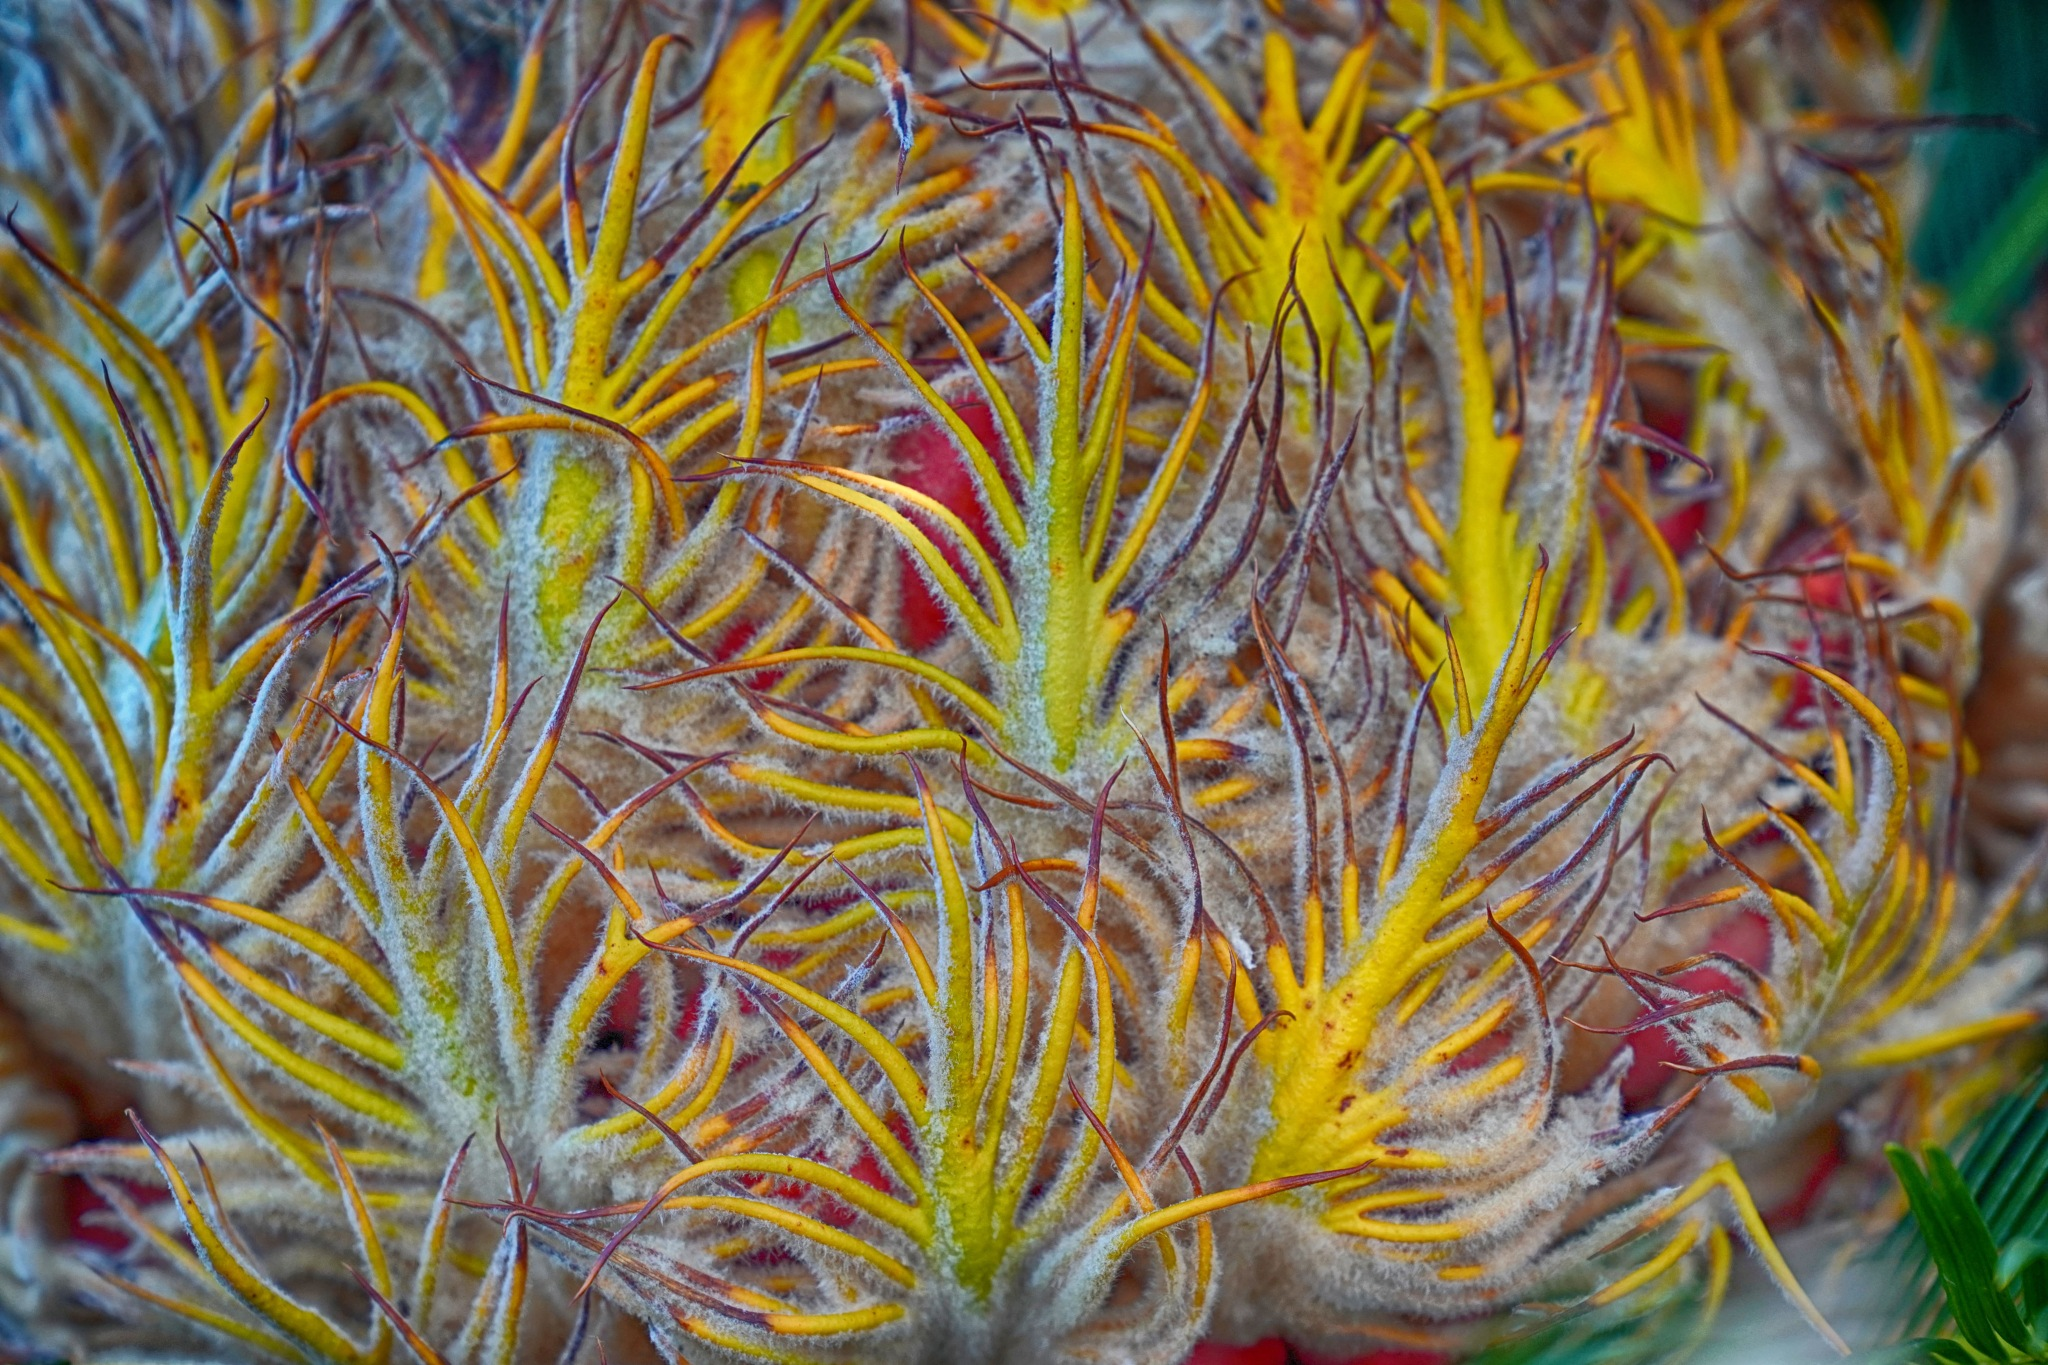 Palm Fruit - Okinawa by James K Polmanteer